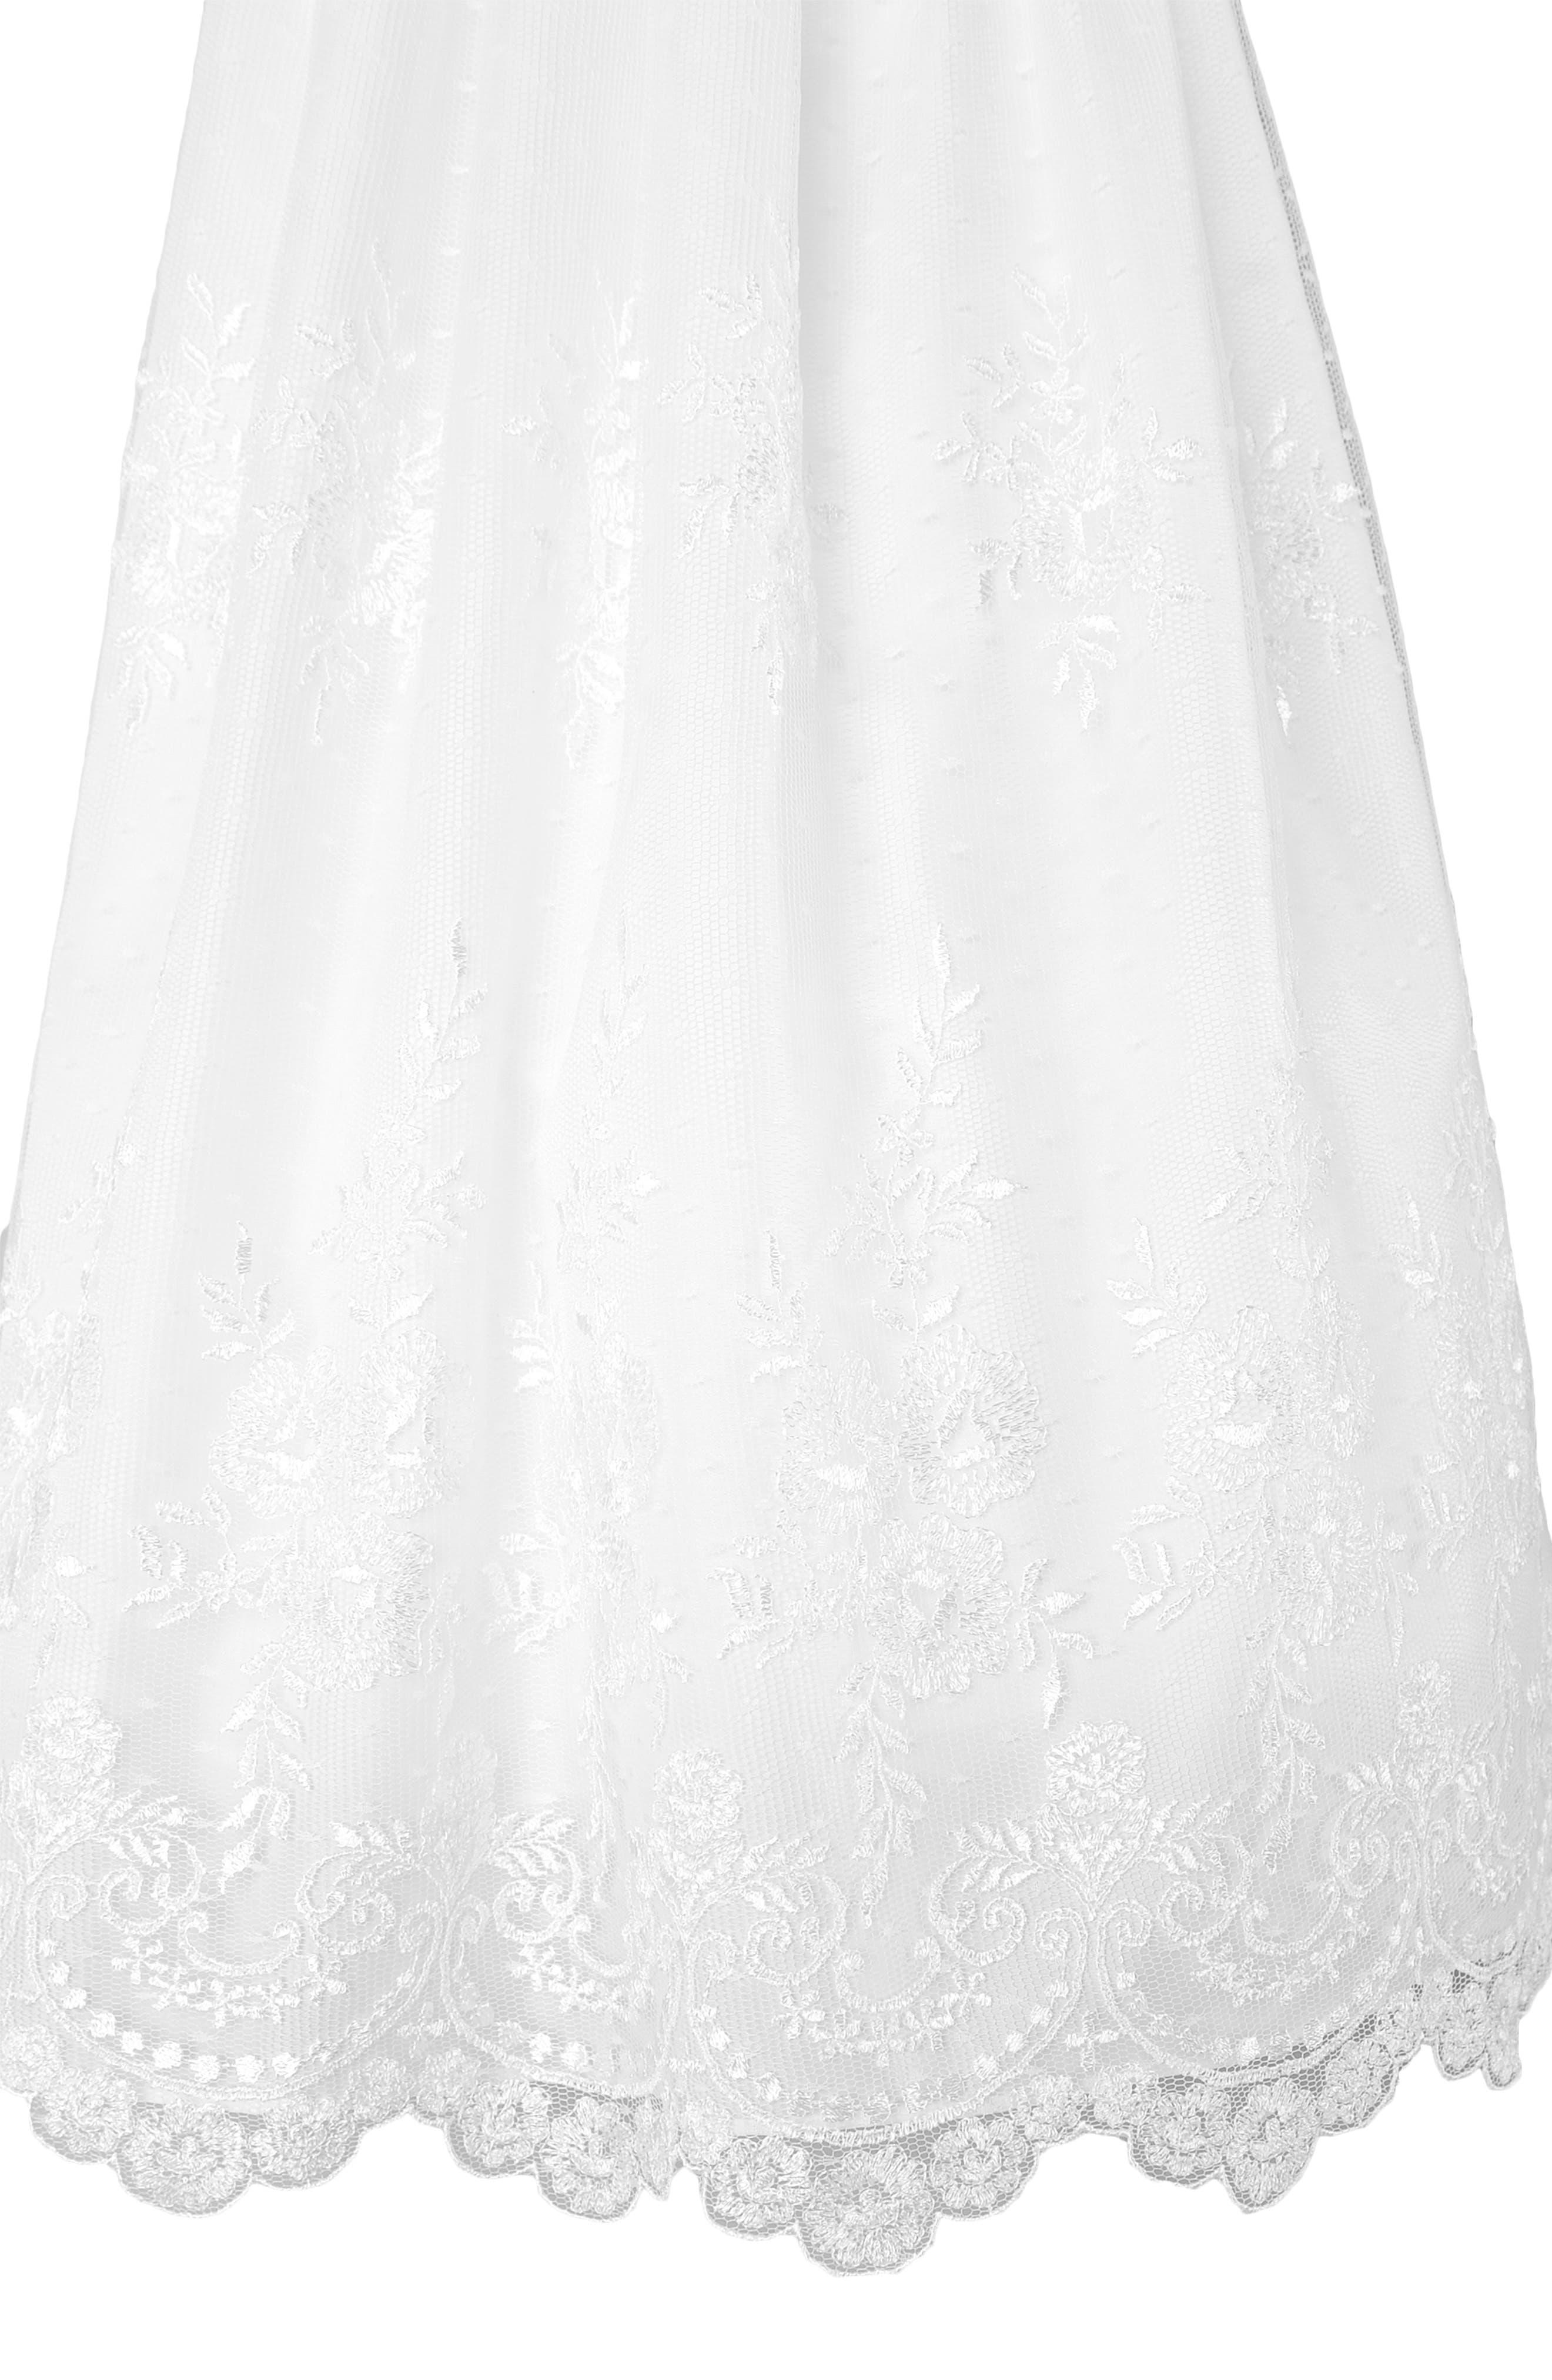 LITTLE THINGS MEAN A LOT, Christening Gown, Shawl, Slip & Bonnet Set, Alternate thumbnail 2, color, WHITE